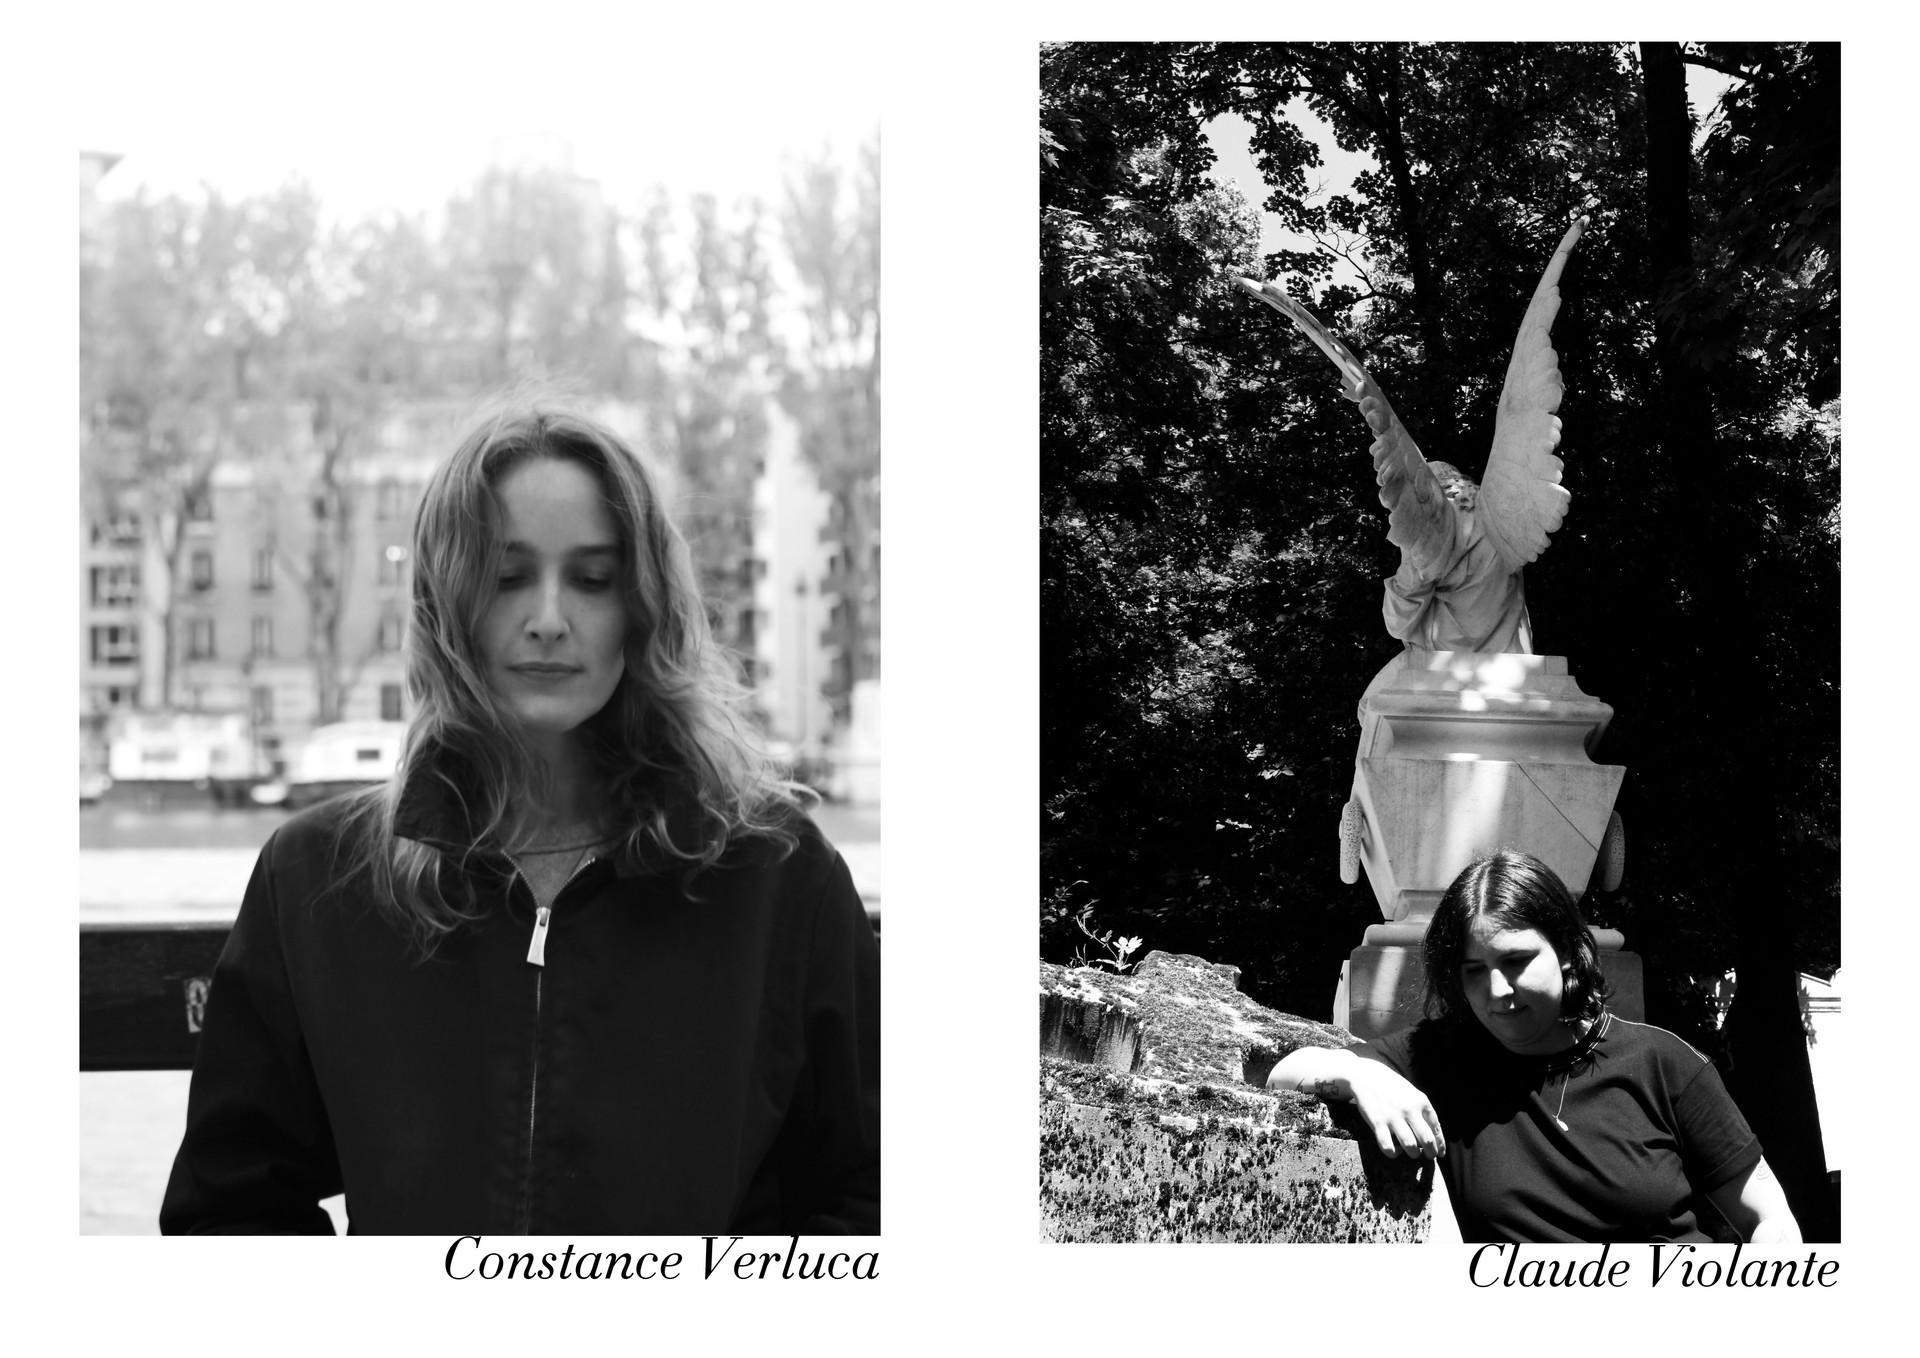 Constance Verluca et Claude Violante par Nicolas Vidal  #chanteusesdefrance